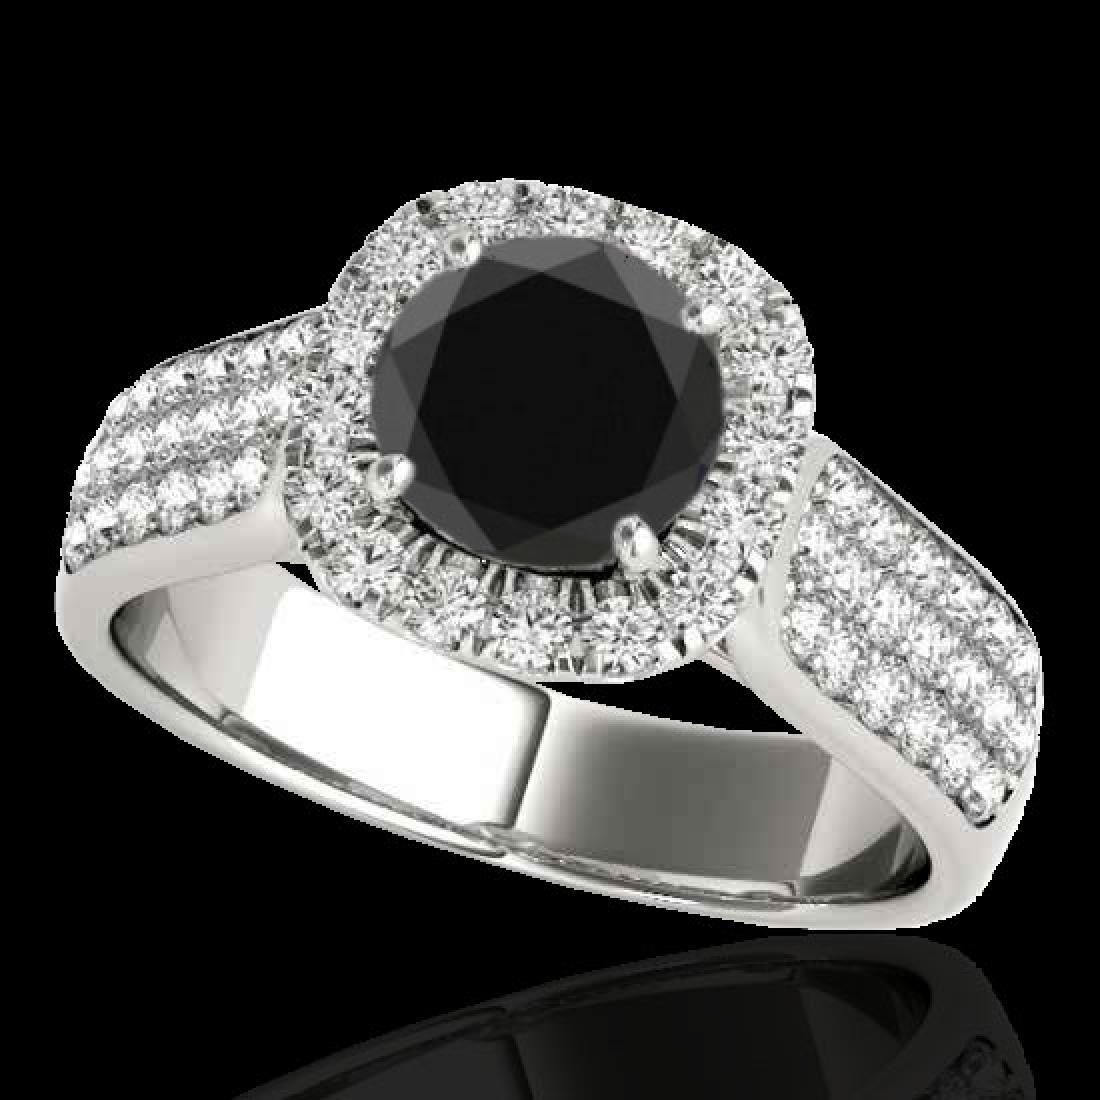 1.8 CTW Certified VS Black Diamond Solitaire Halo Ring